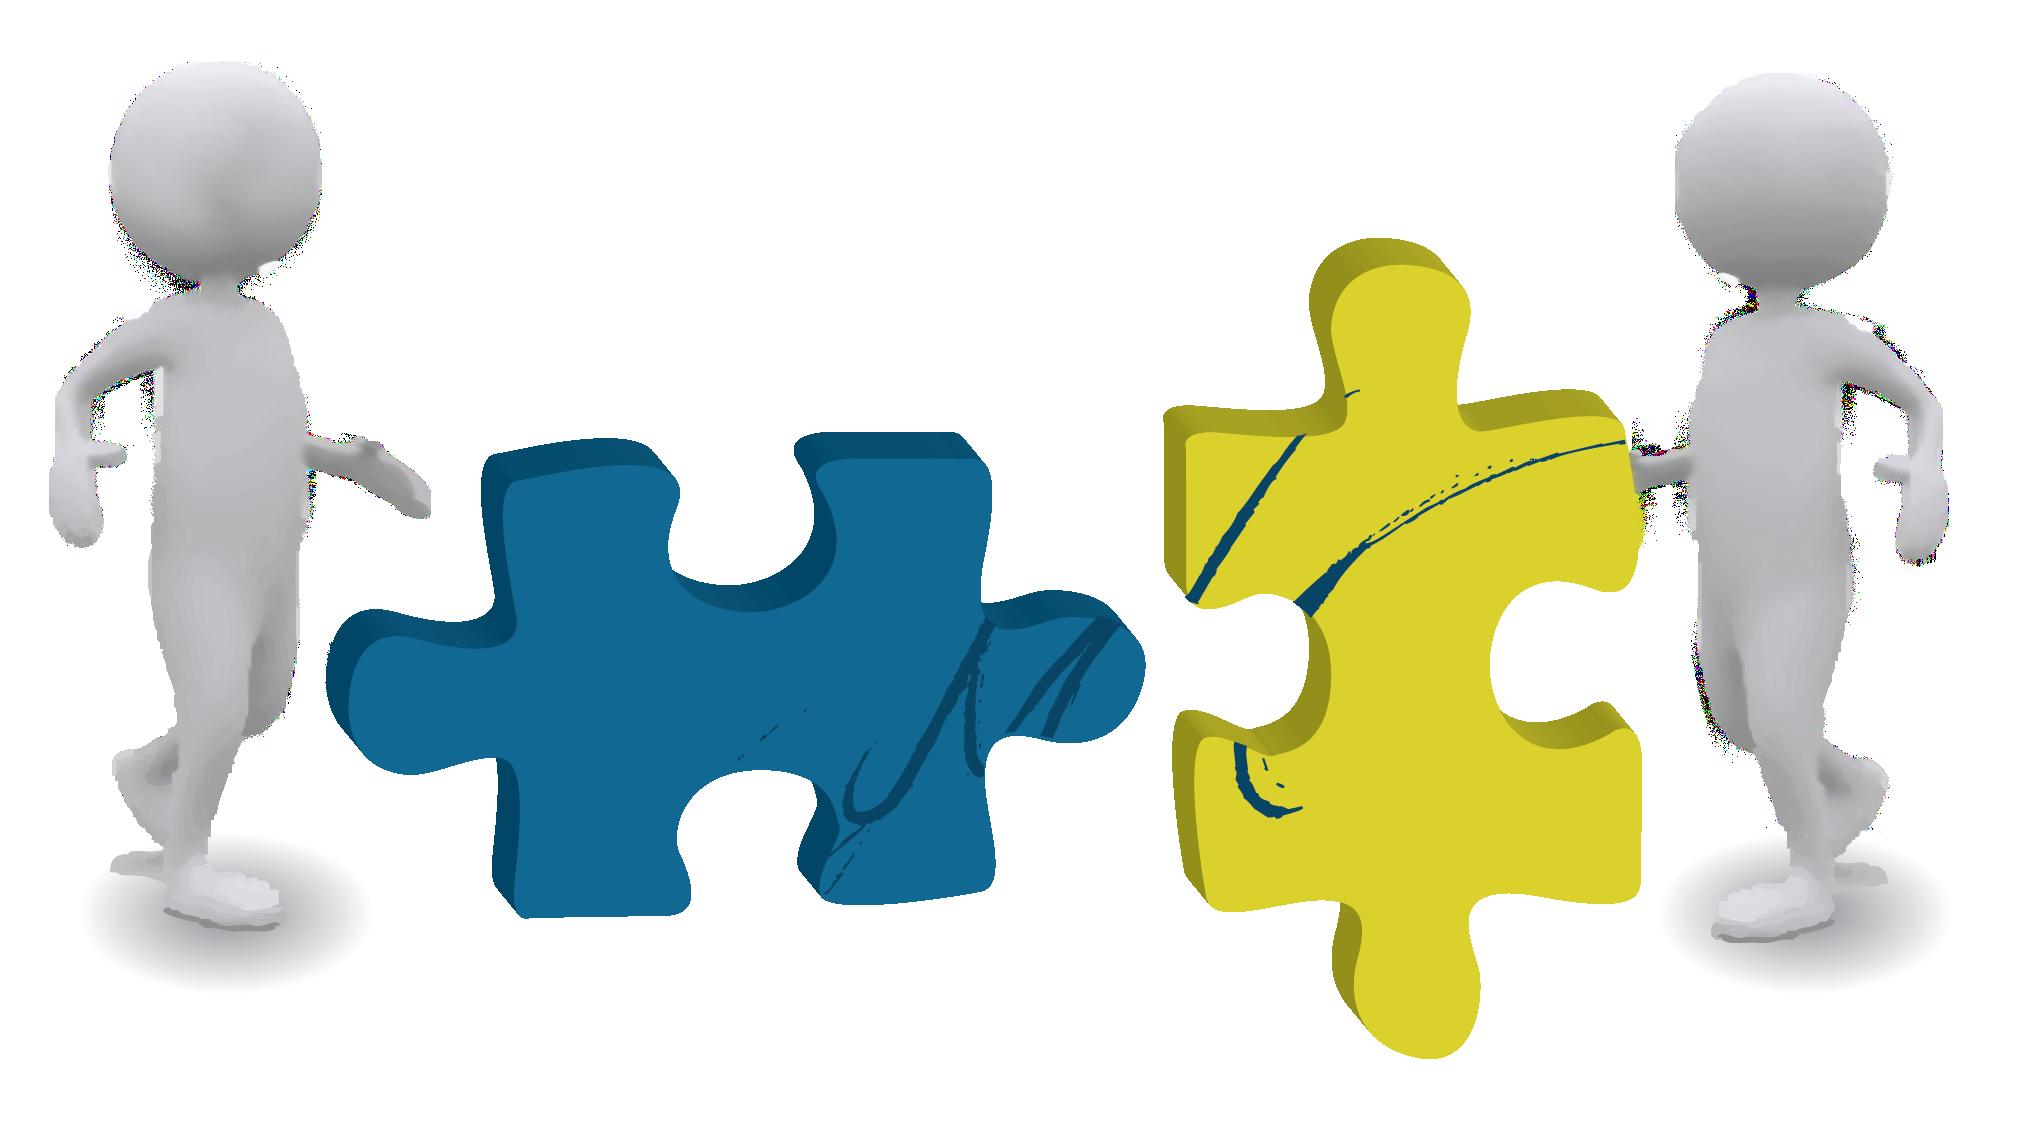 wie zijn we 01 mirate zorgmirate zorg autisme gouda logo designbyelja elja